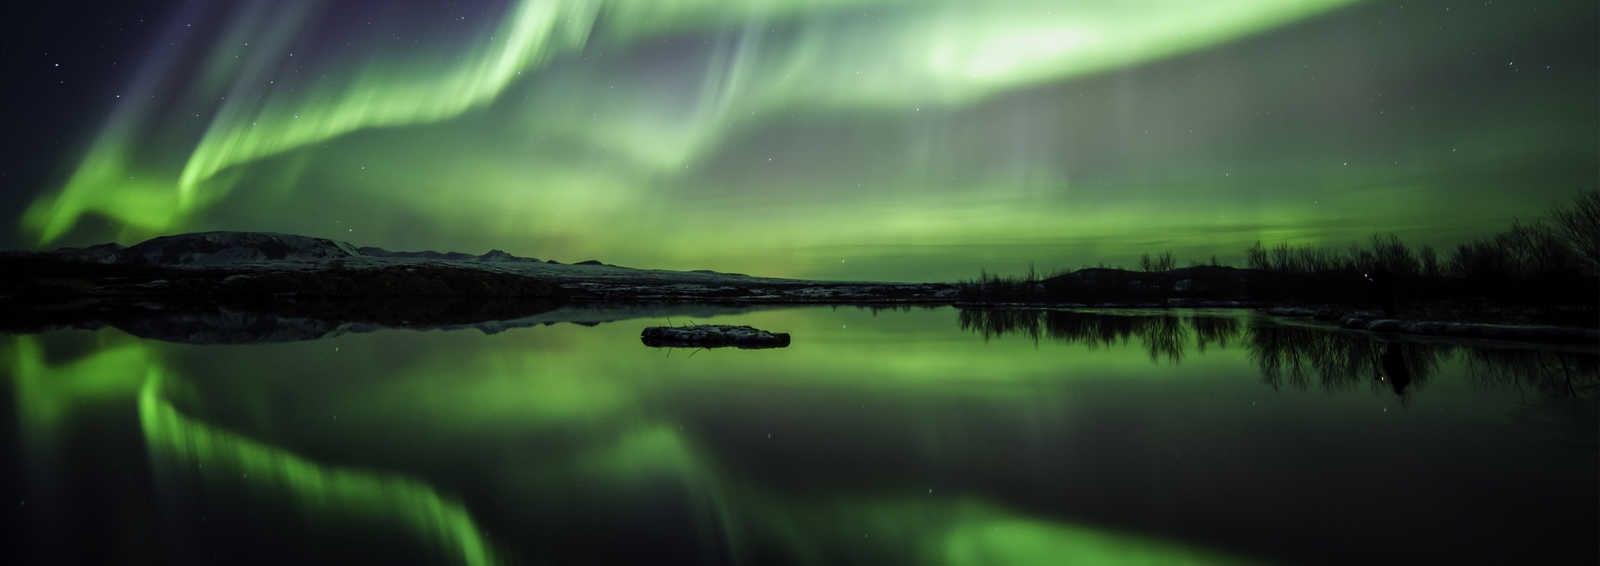 The Aurora dancing over Thingvellir N.P